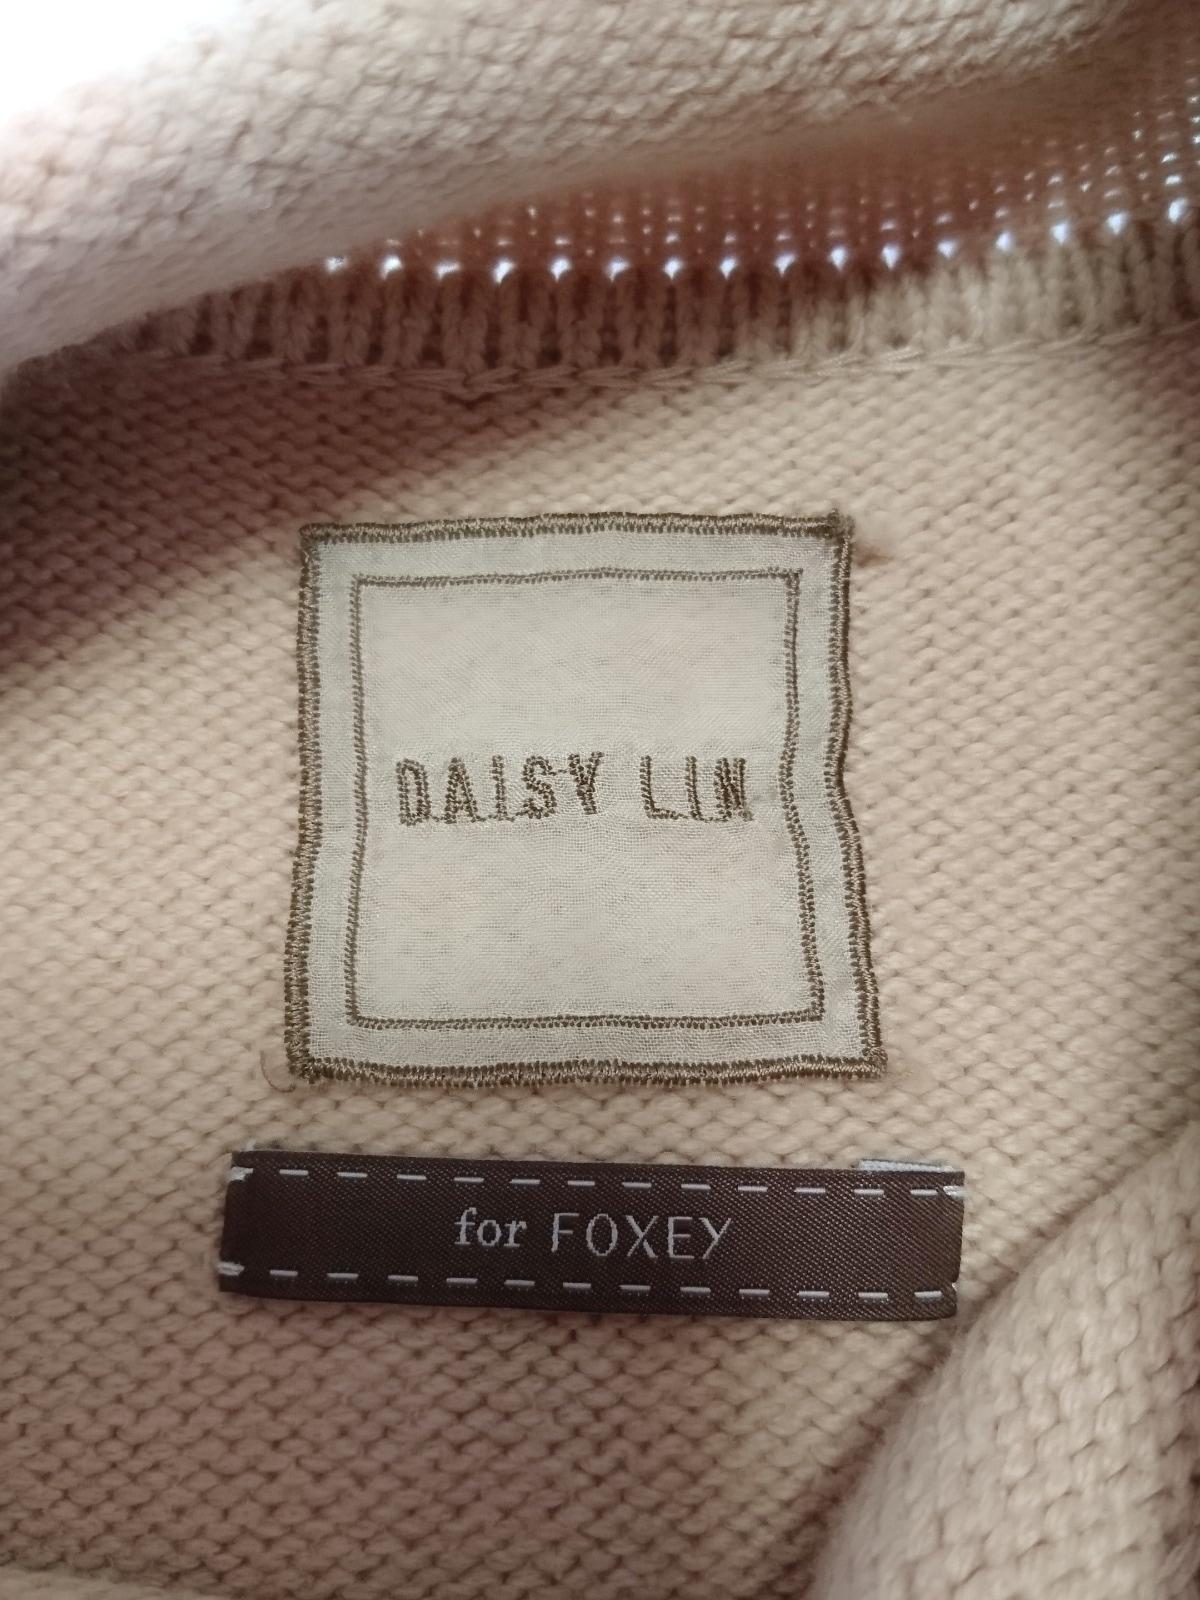 DAISY LIN(デイジーリン)のチュニック